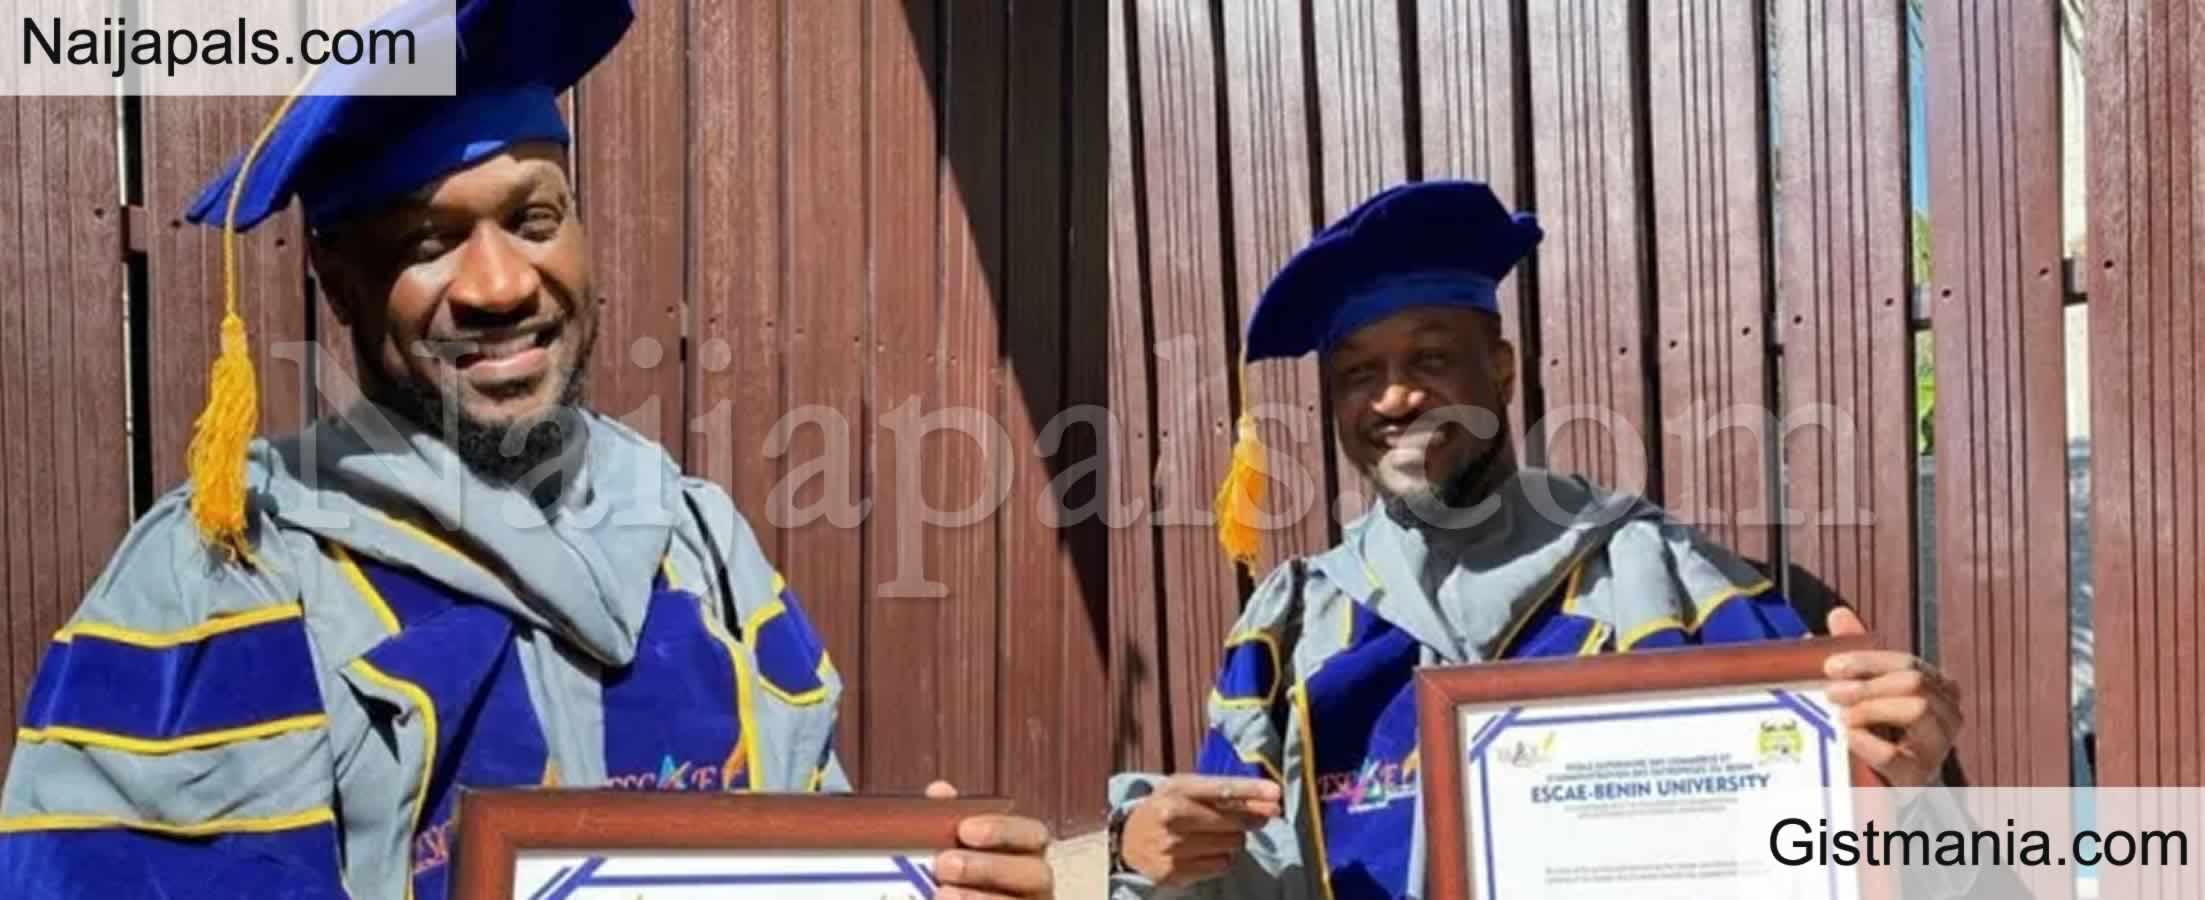 <img alt='.' class='lazyload' data-src='https://img.gistmania.com/emot/news.gif' /><b>Peter Okoye Bags Honorary Doctorate Degree From Escae-Benin University, Benin Republic</b>